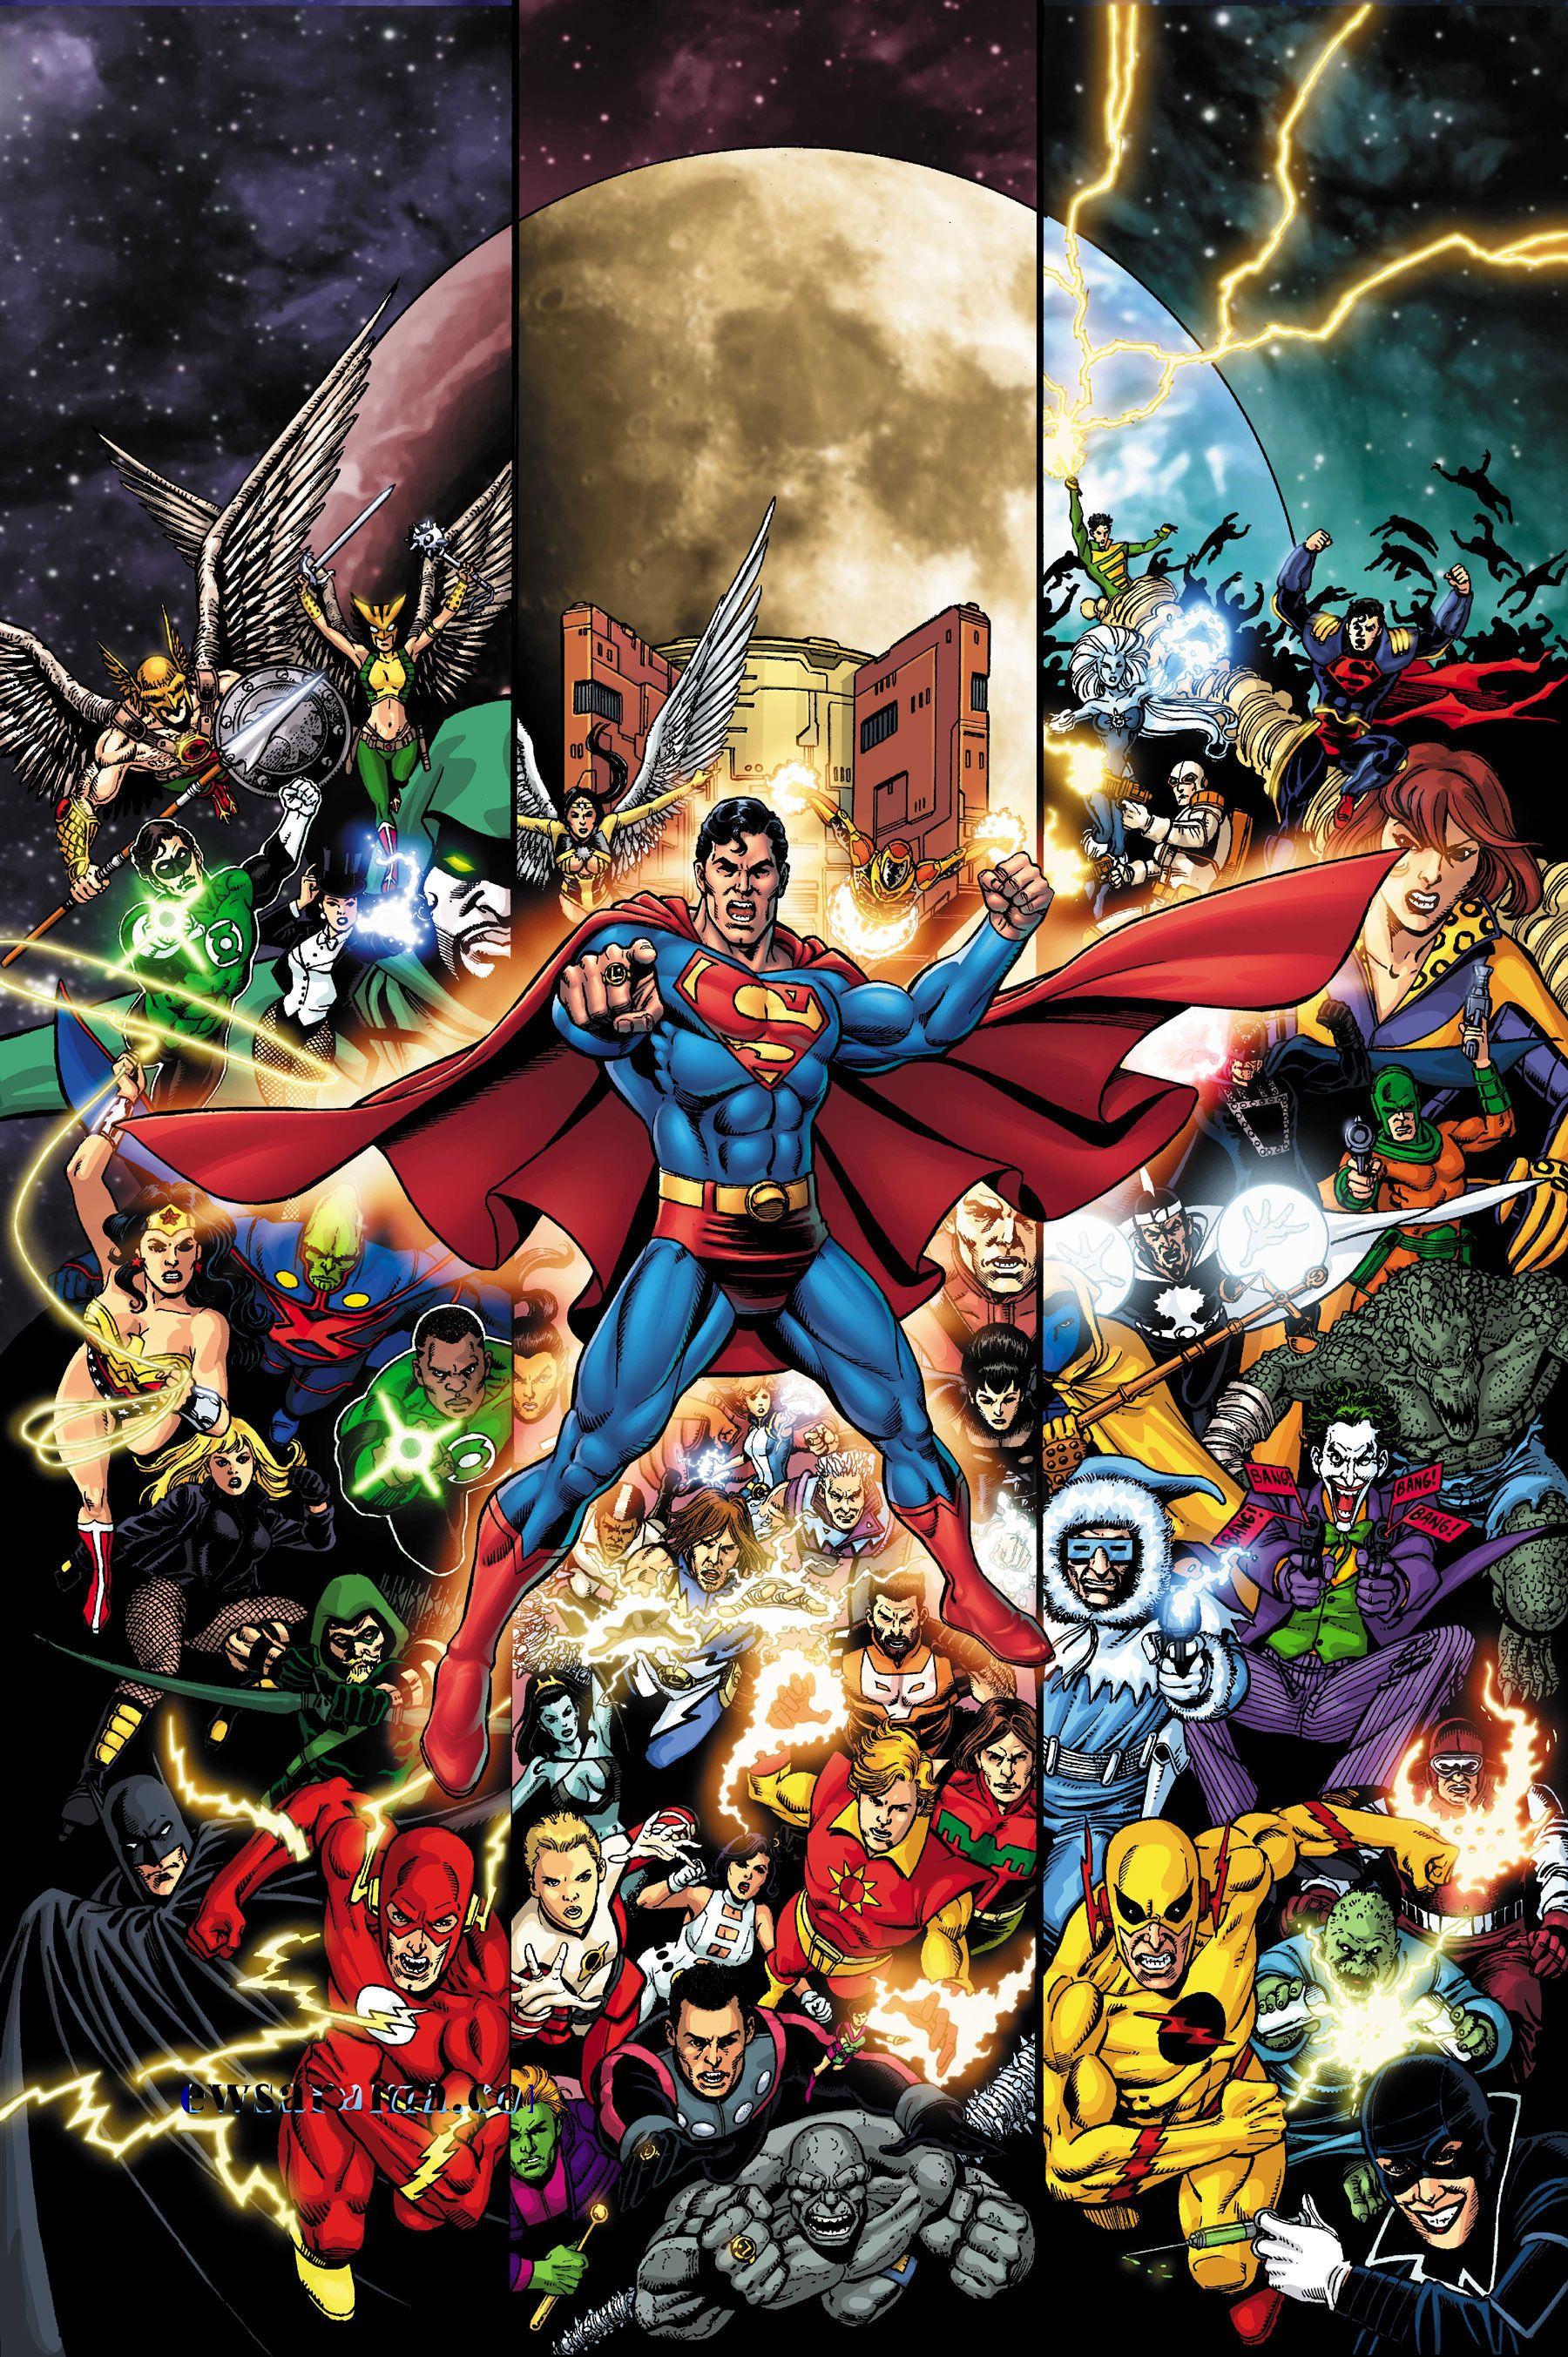 Superheroes Villains The Ultimate List Of Illustrations And Artworks Dc Comics Superheroes Dc Comics Characters Superhero